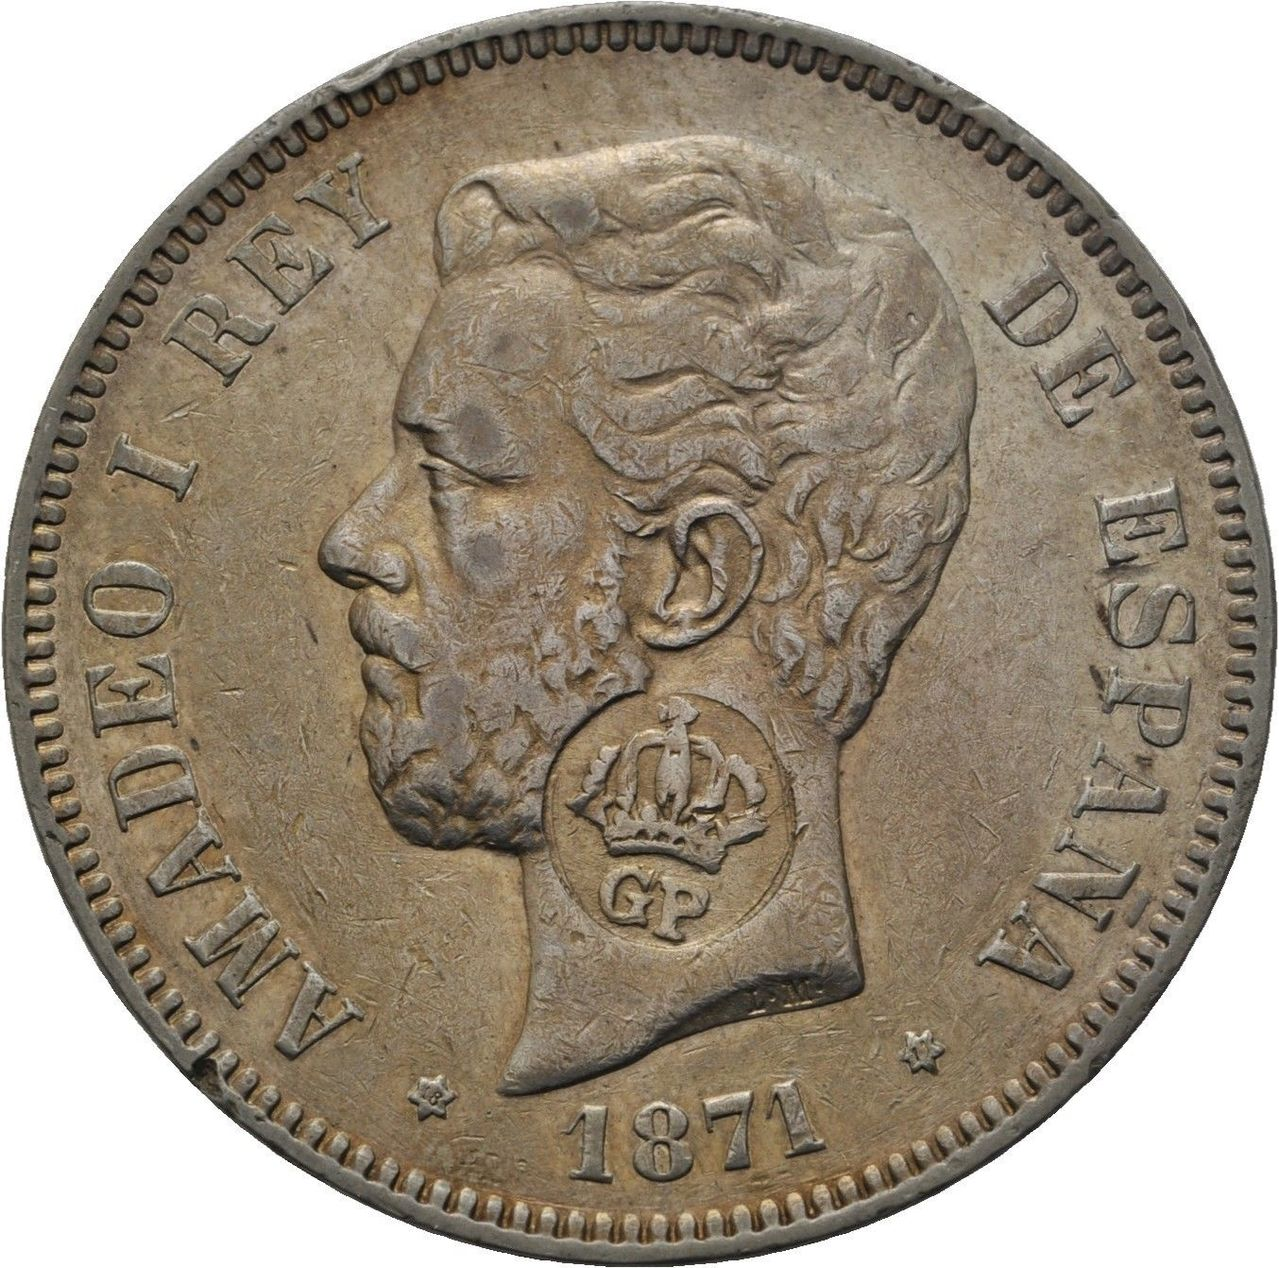 5 PESETAS AMADEO I 1871 *71 RESELLO AZORES ¿AUTENTICO? Image